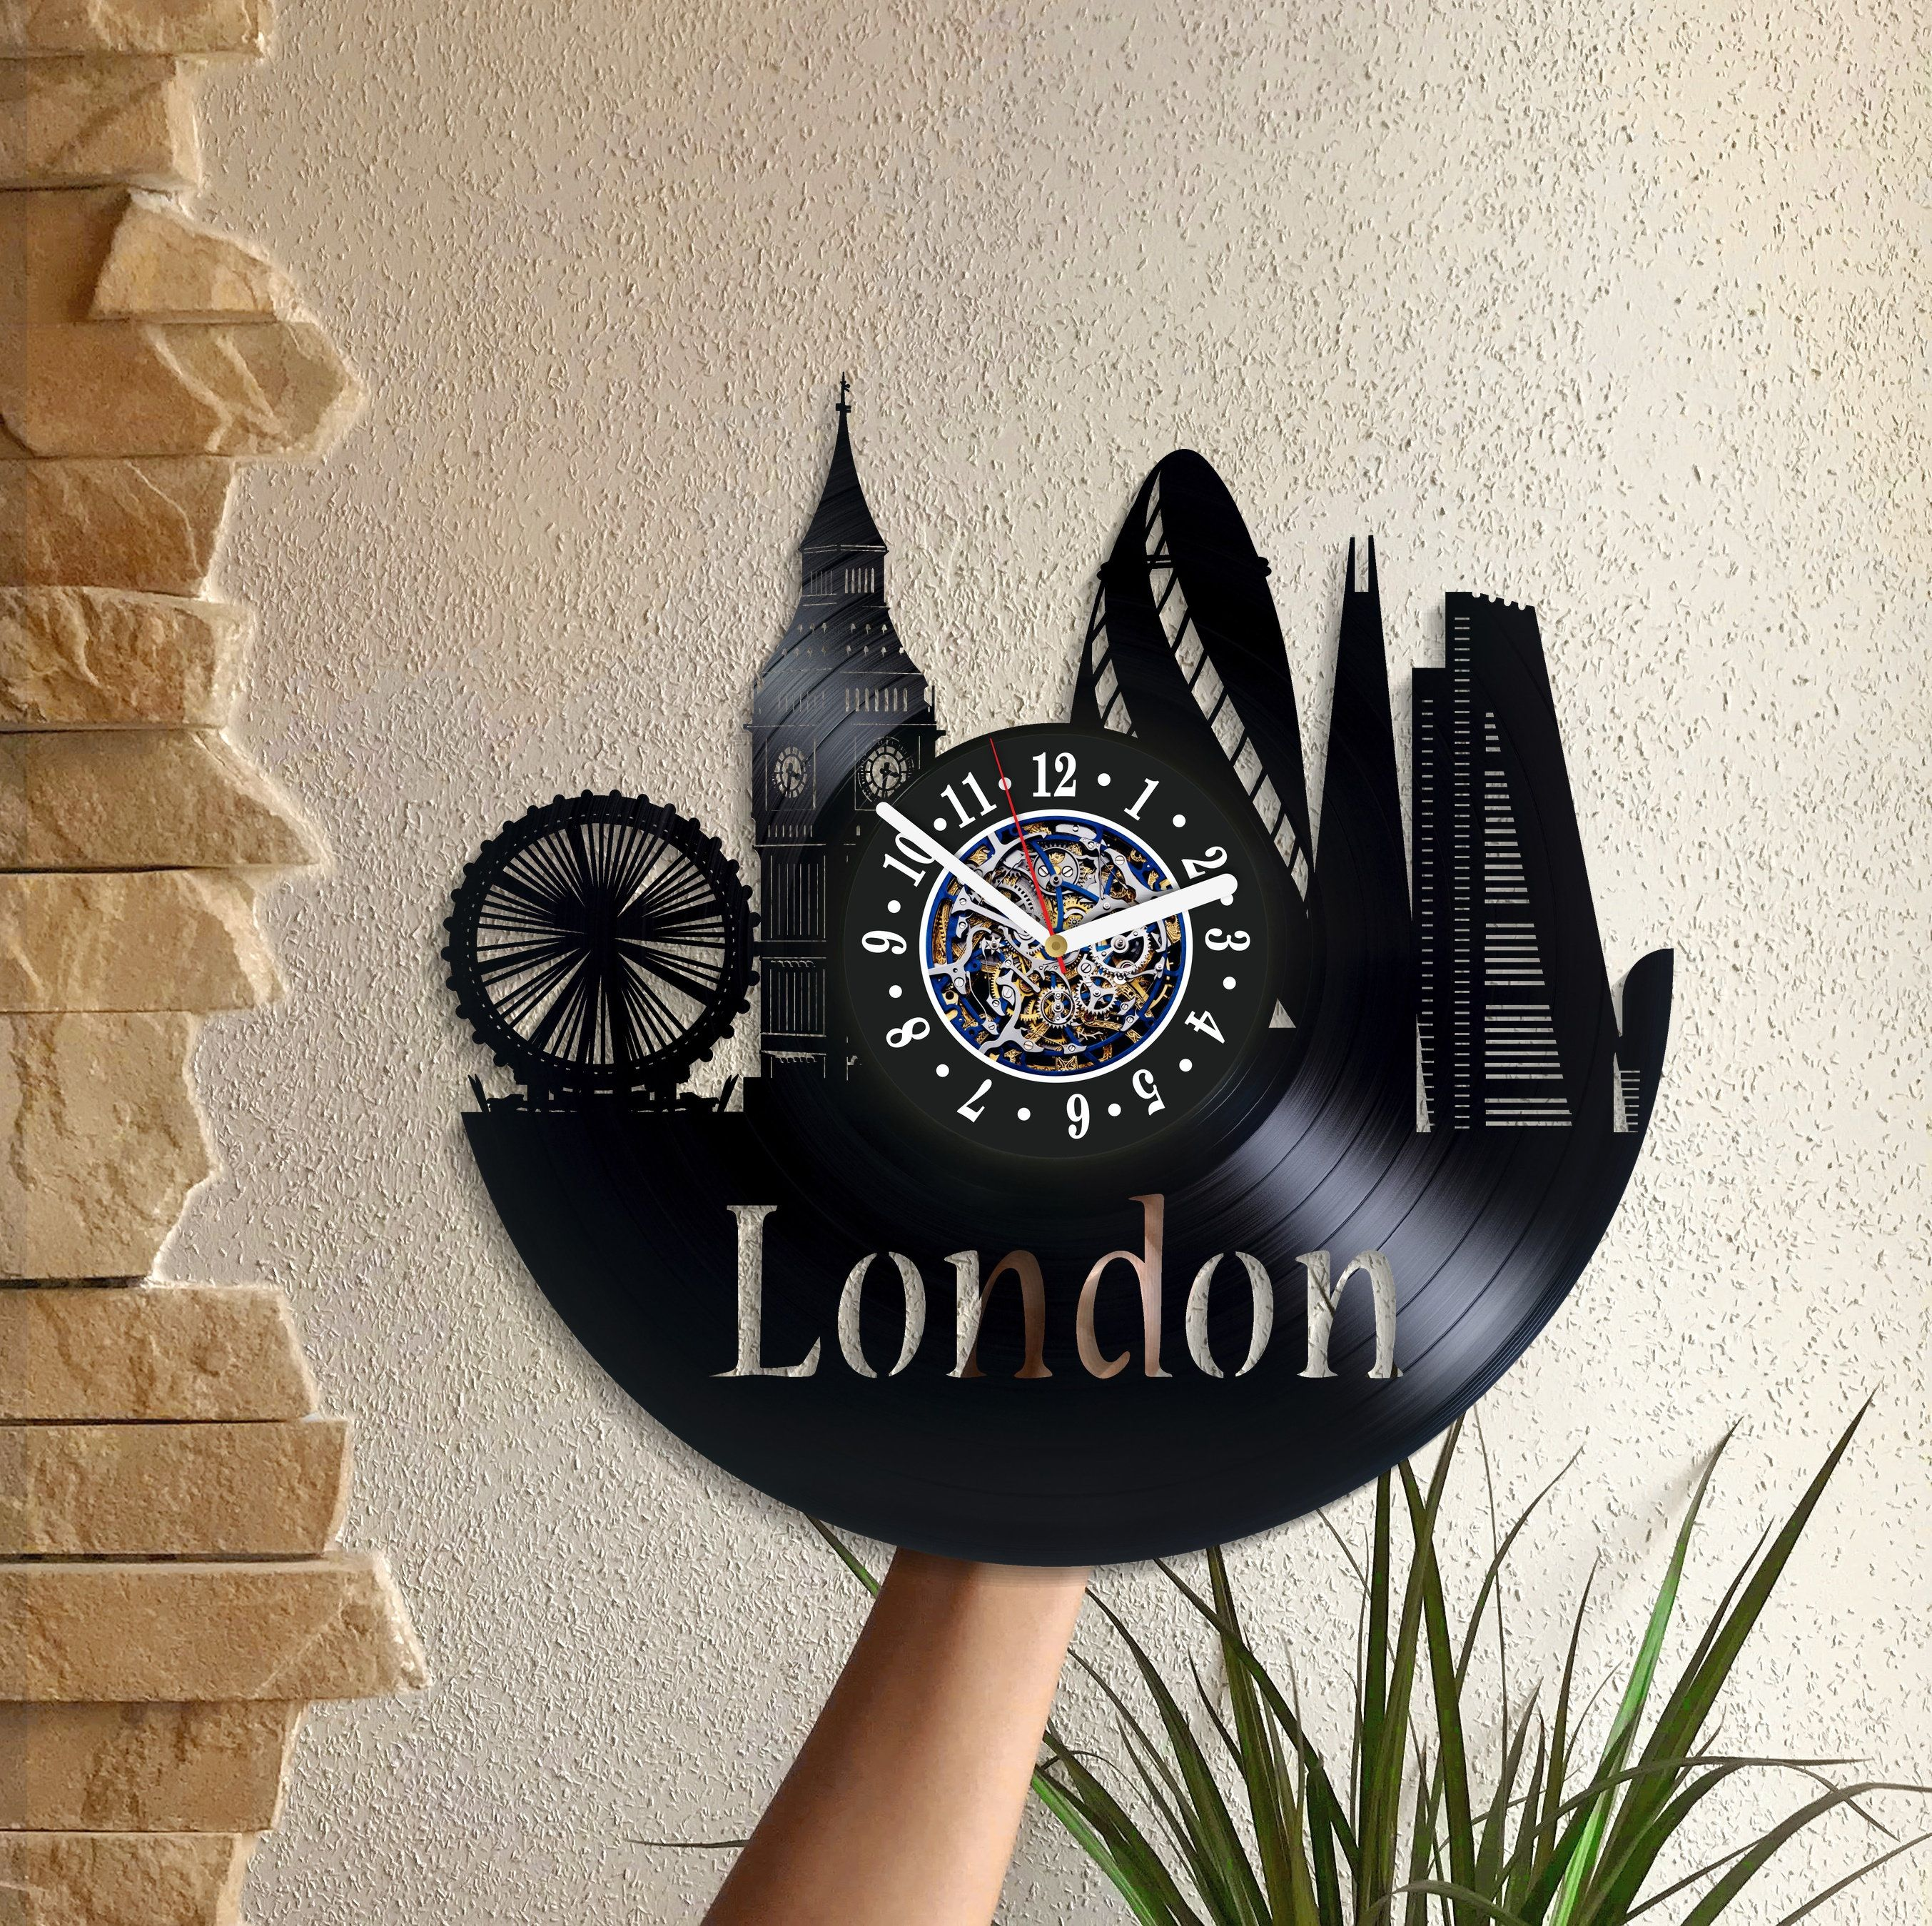 United Kingdom Gift London Room Art Lp Retro Vinyl Record Wall Clock Vintage Birthday For